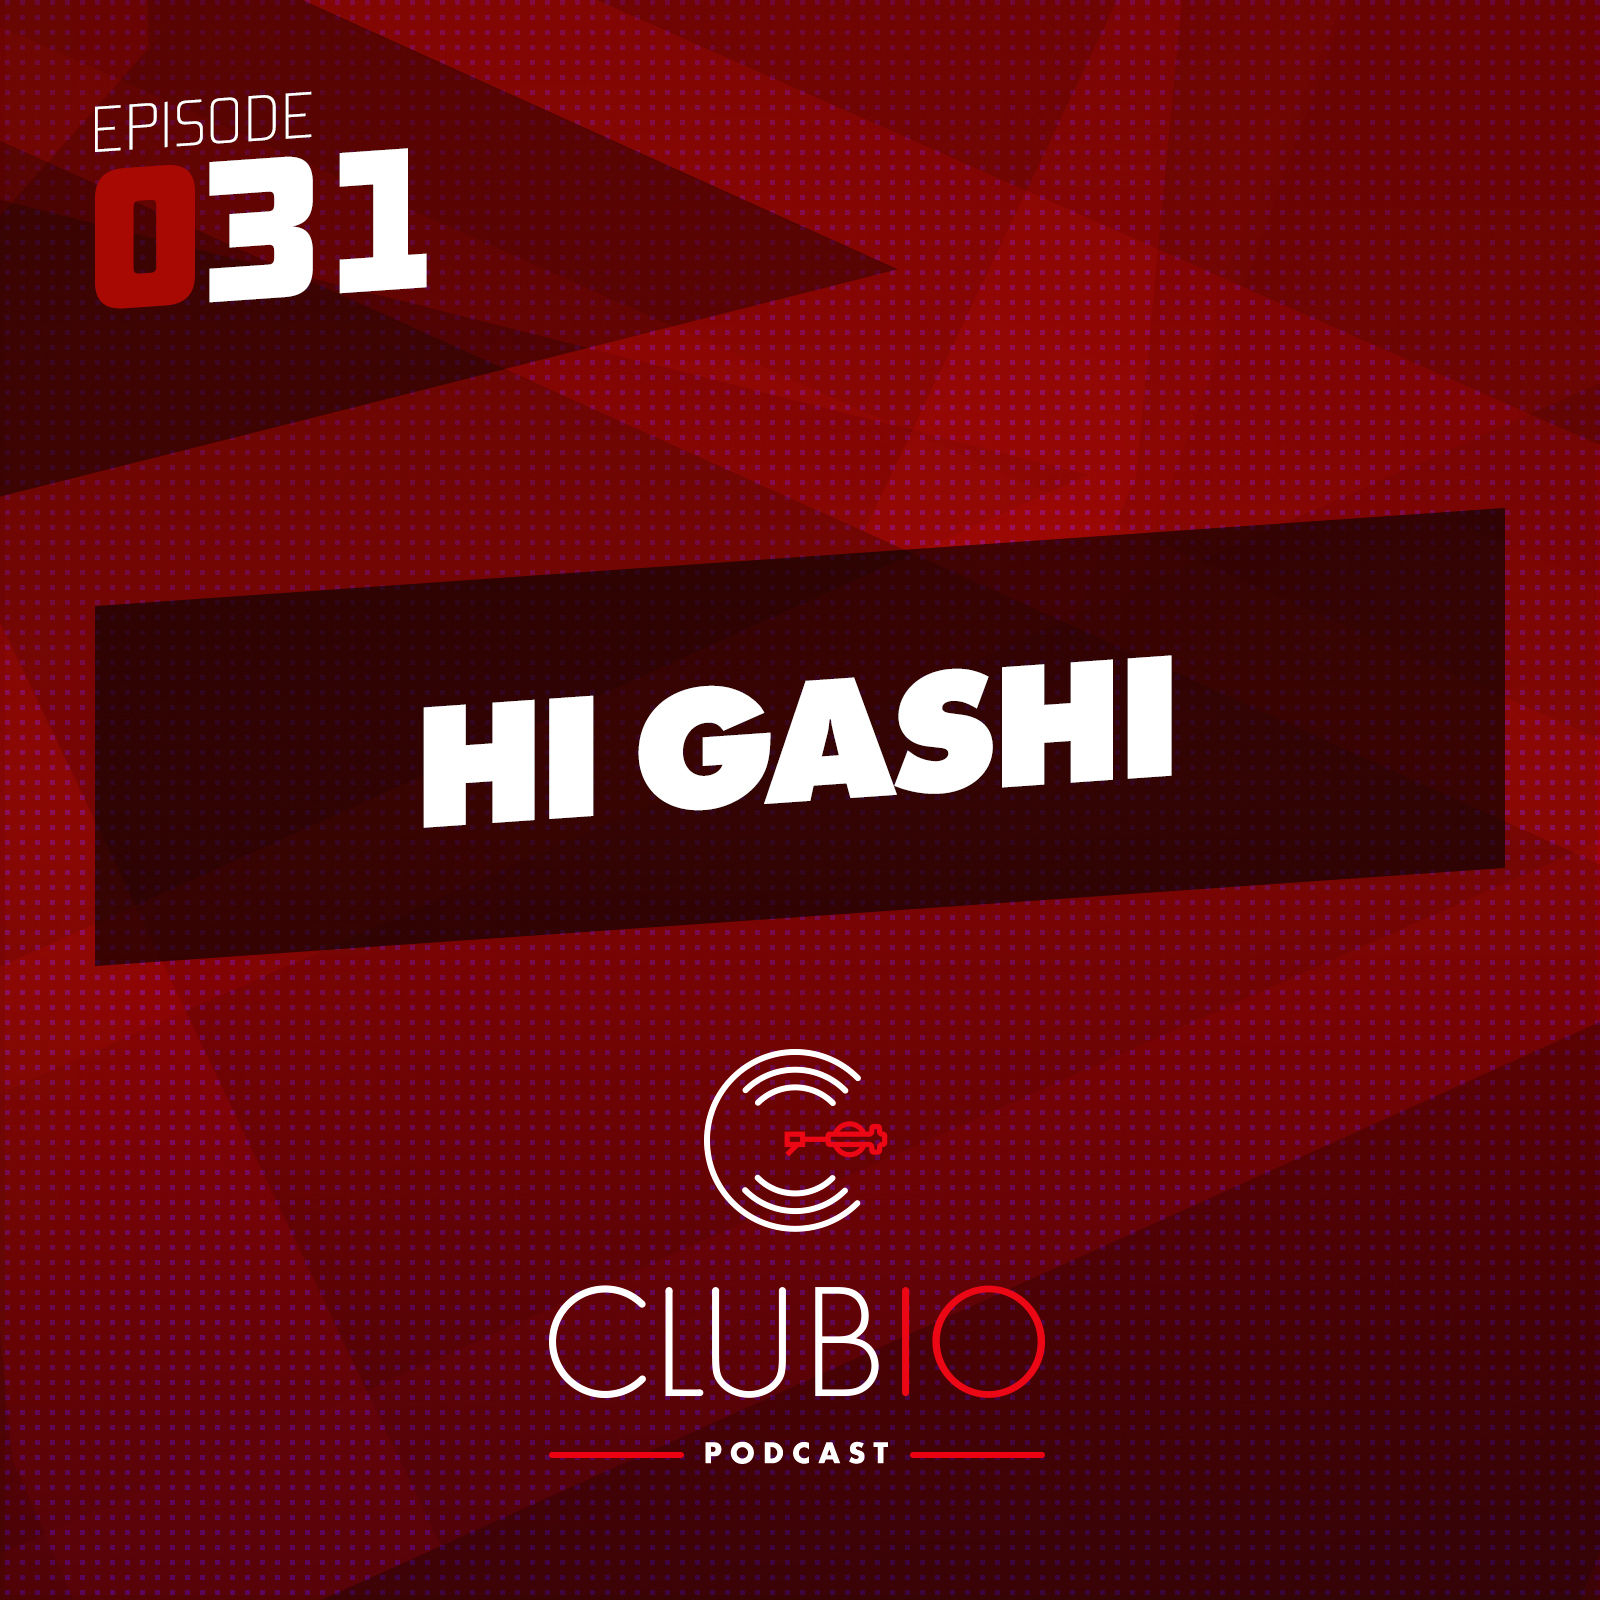 Clubio Podcast 031 - Hi Gashi